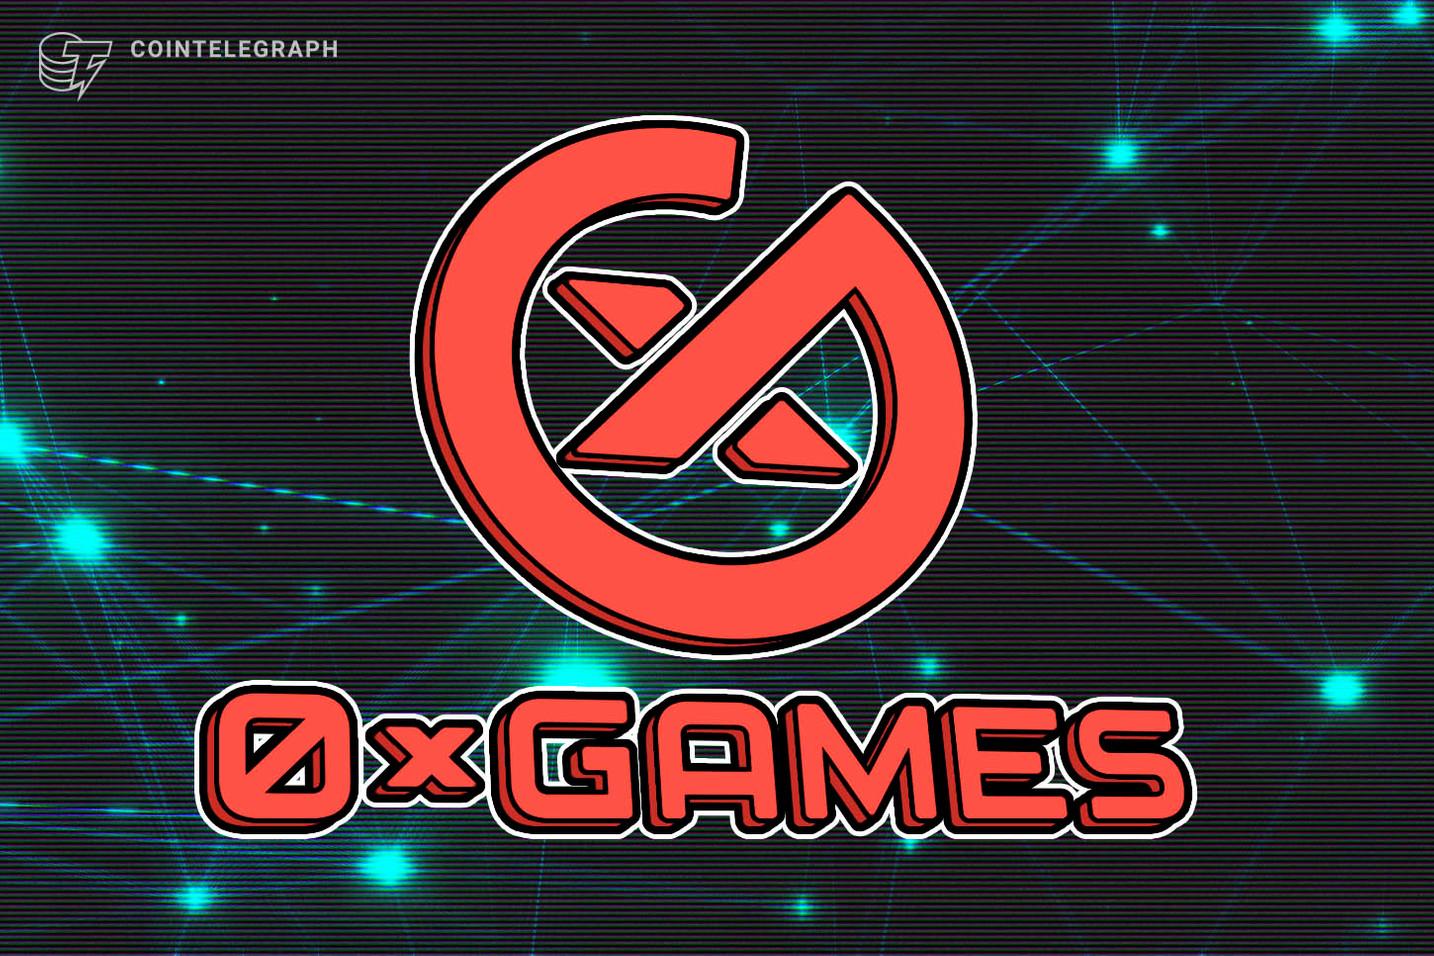 0xGames Integrates NEO in Multiblockchain Arena Battler